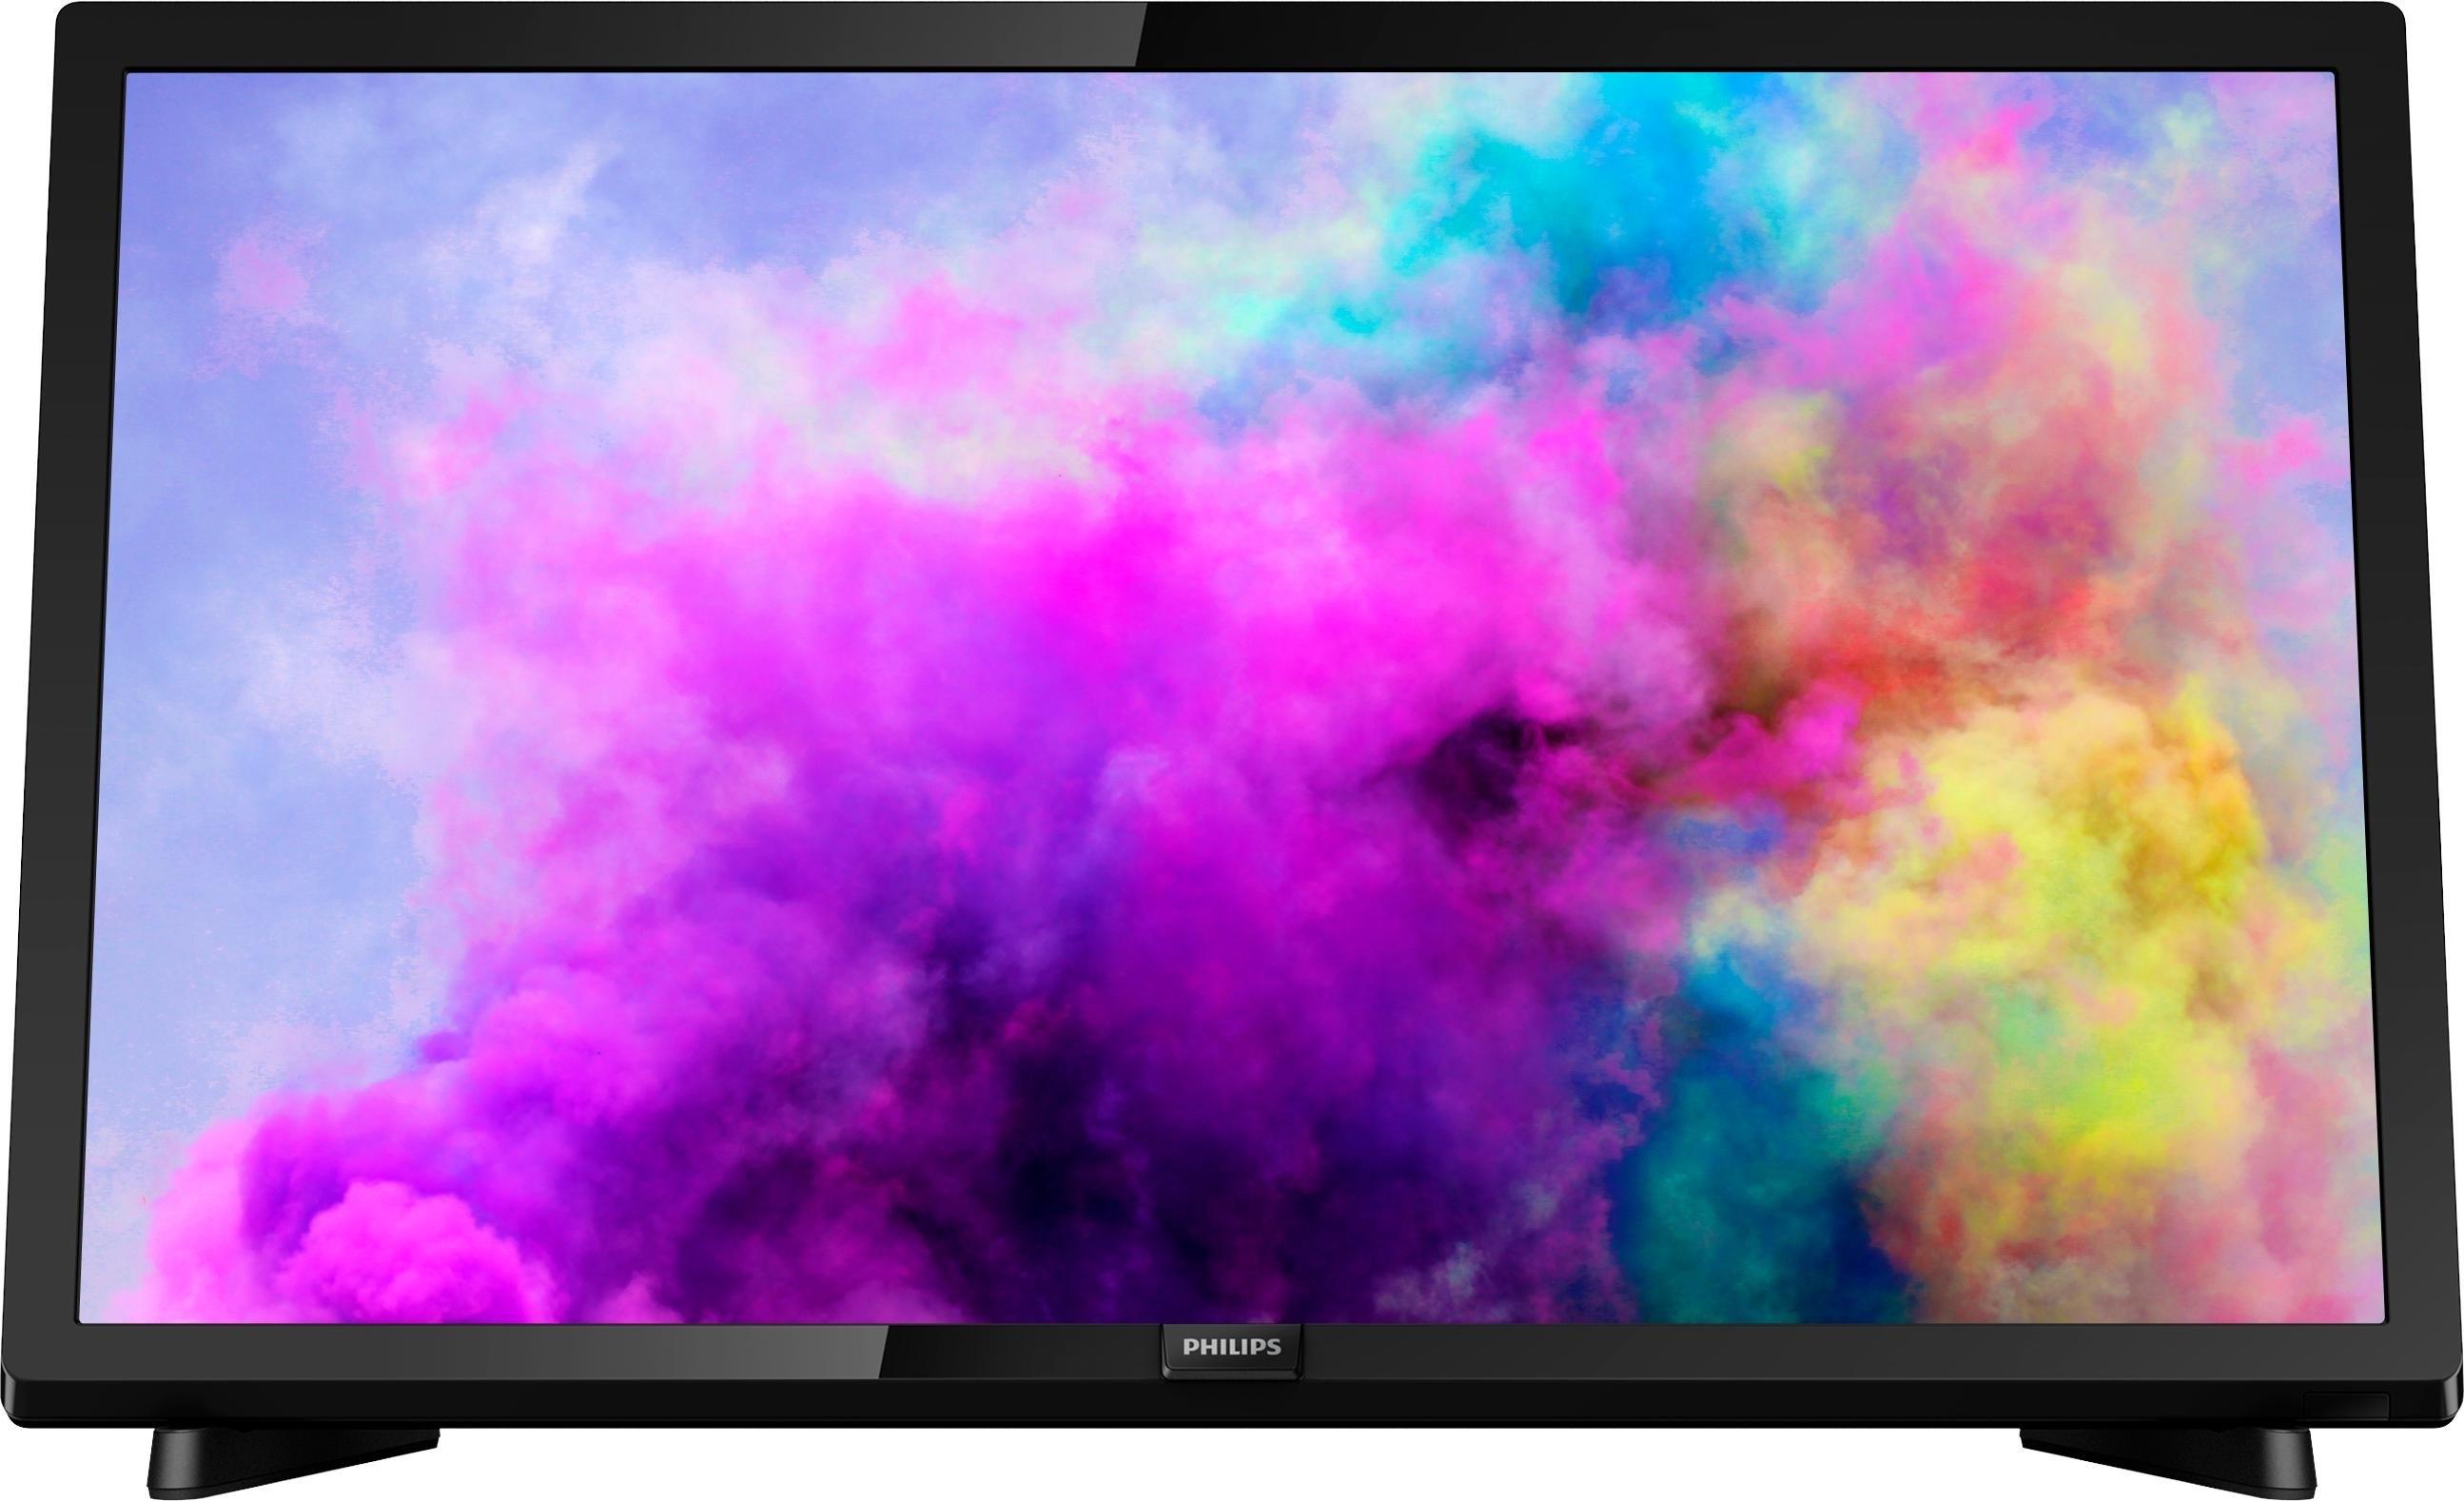 Philips 22PFS5403/12 led-tv (22 inch), Full HD nu online bestellen